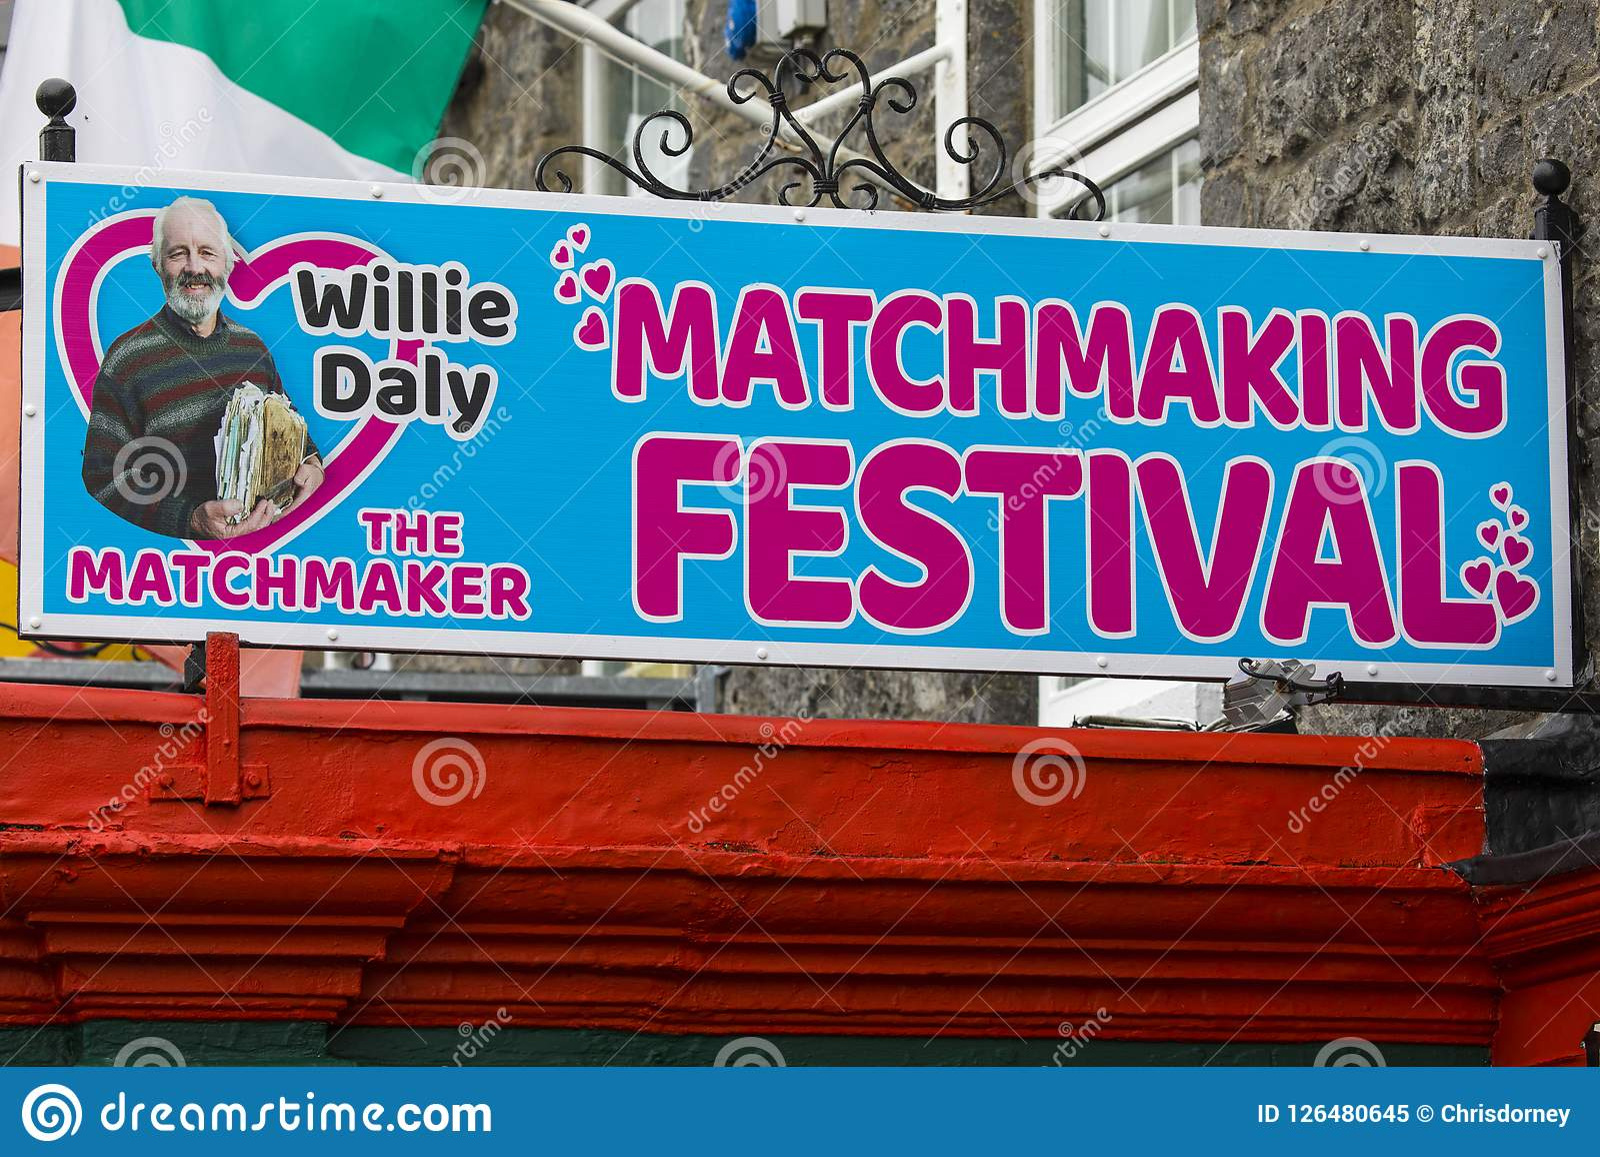 ireland matchmaking festival 2013 interesser for online dating